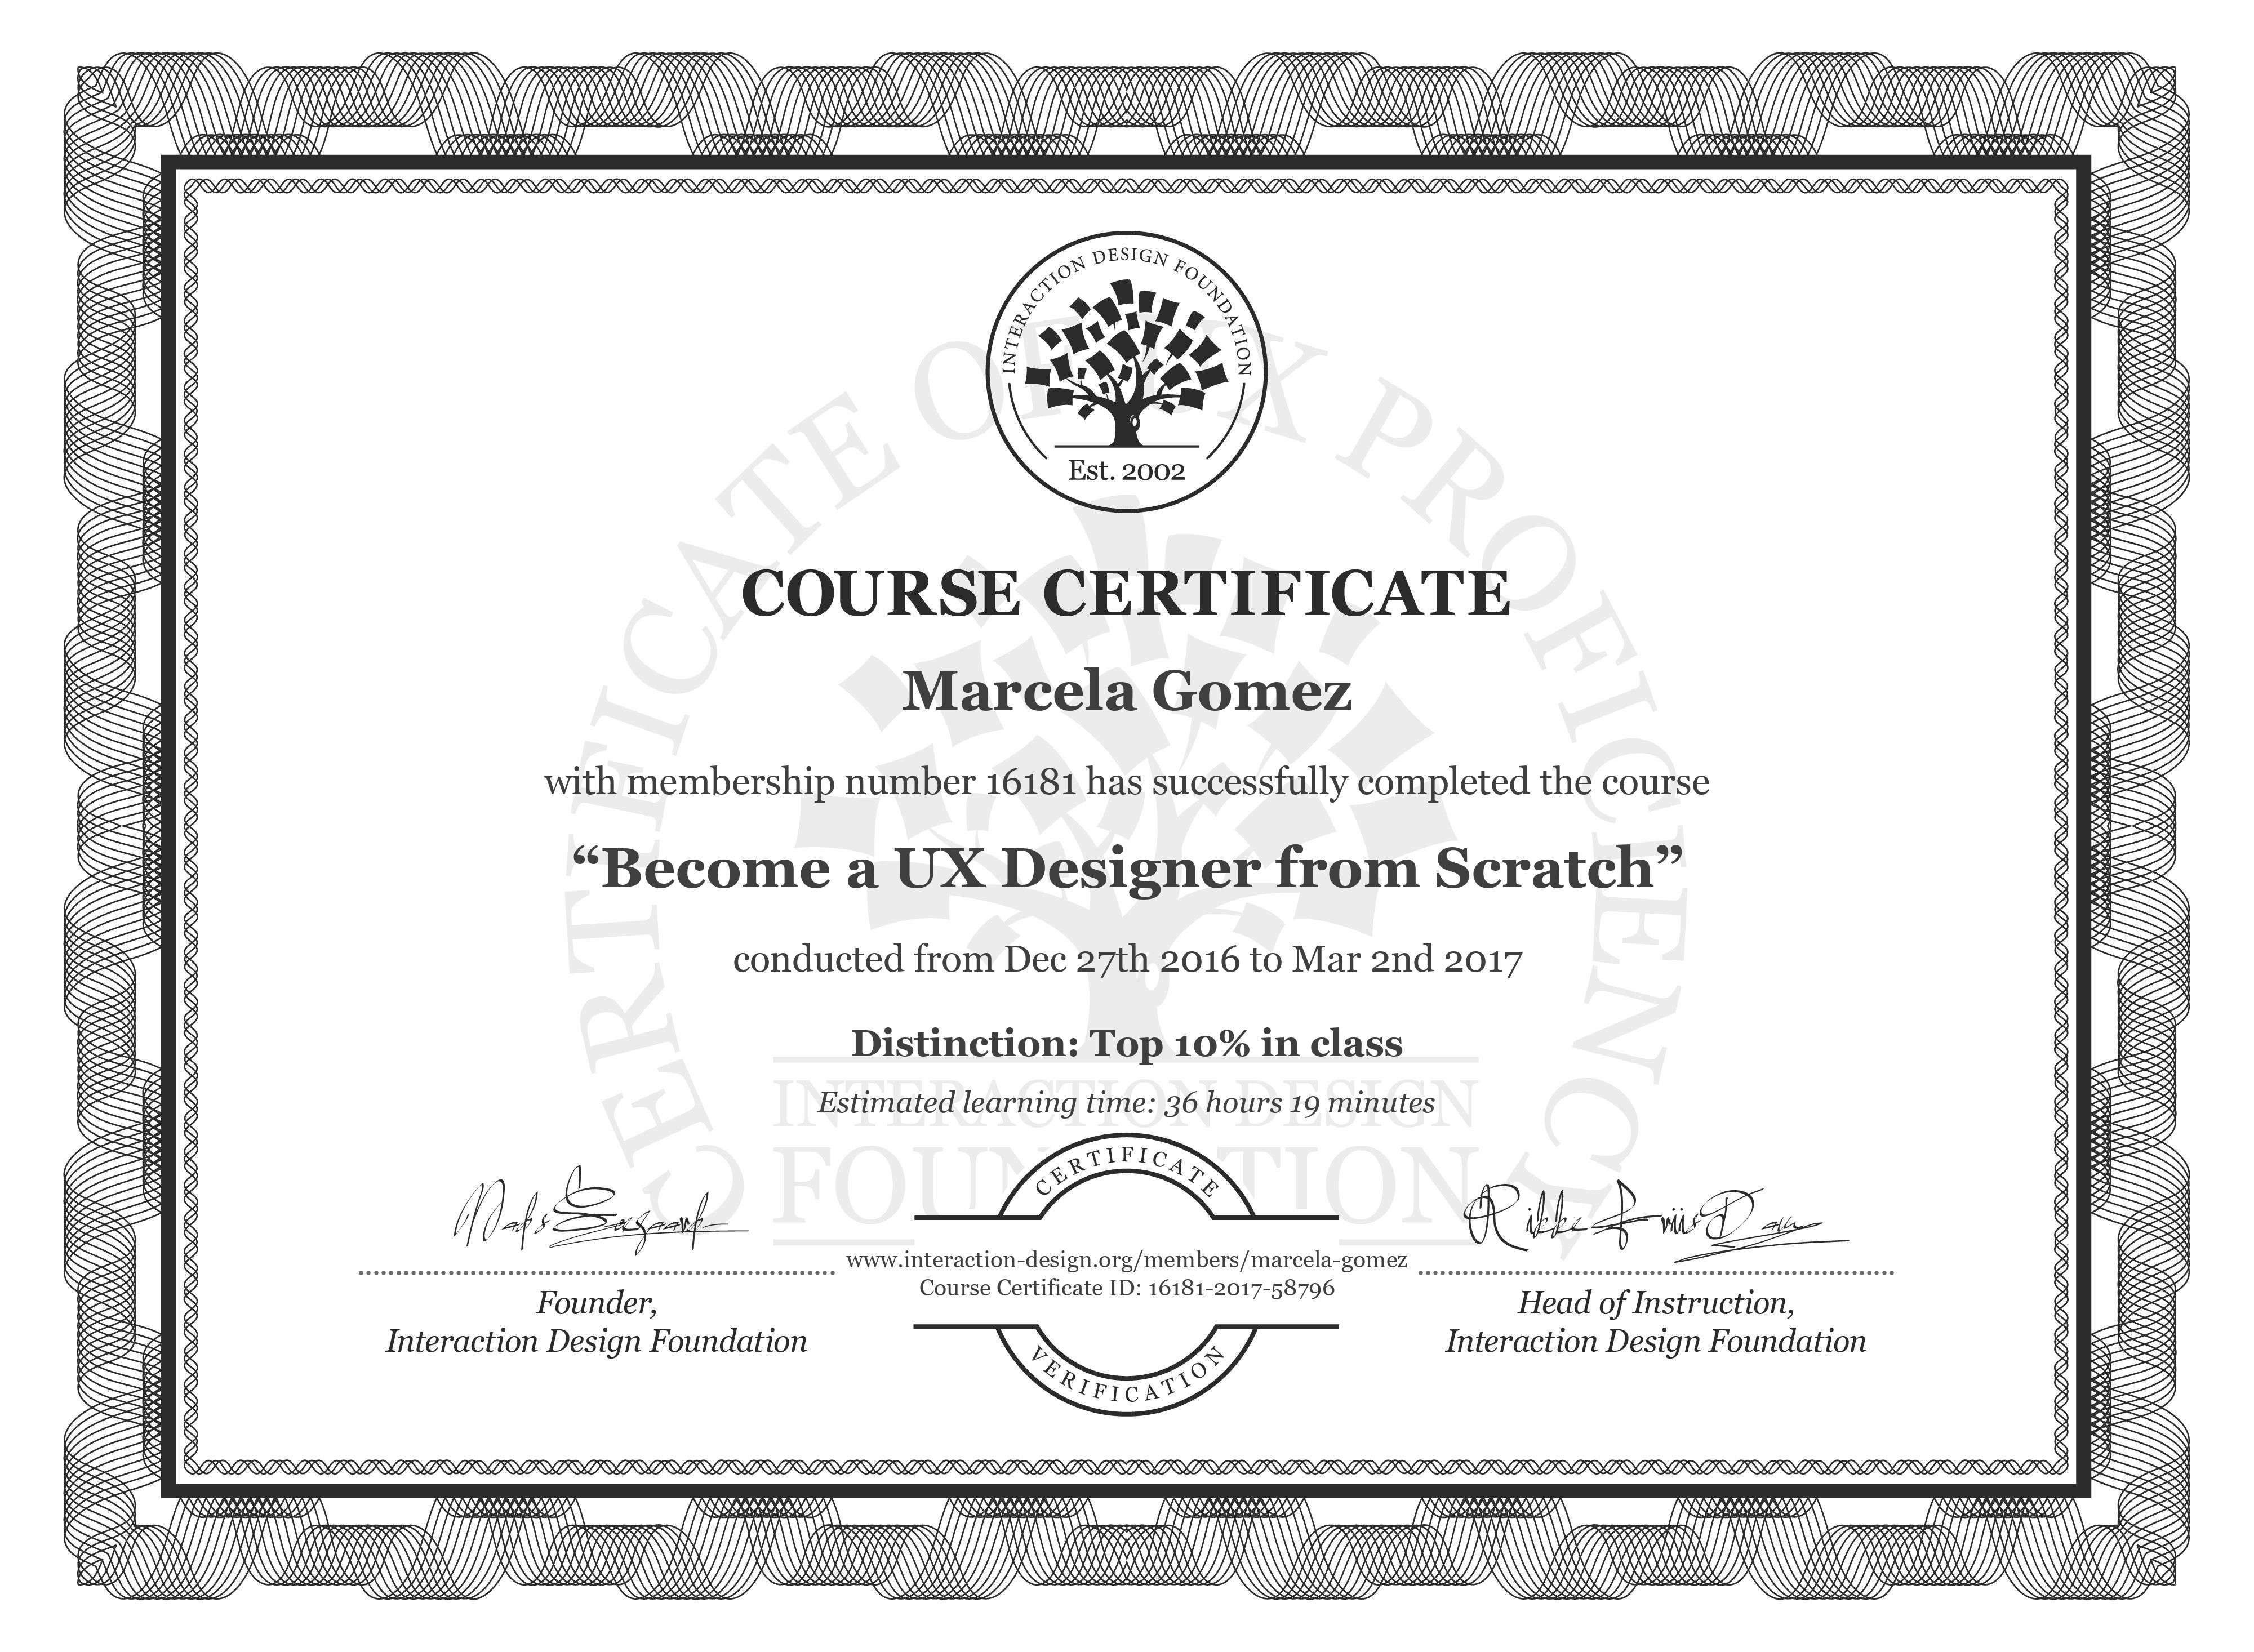 Marcela Gómez: Course Certificate - Become a UX Designer from Scratch